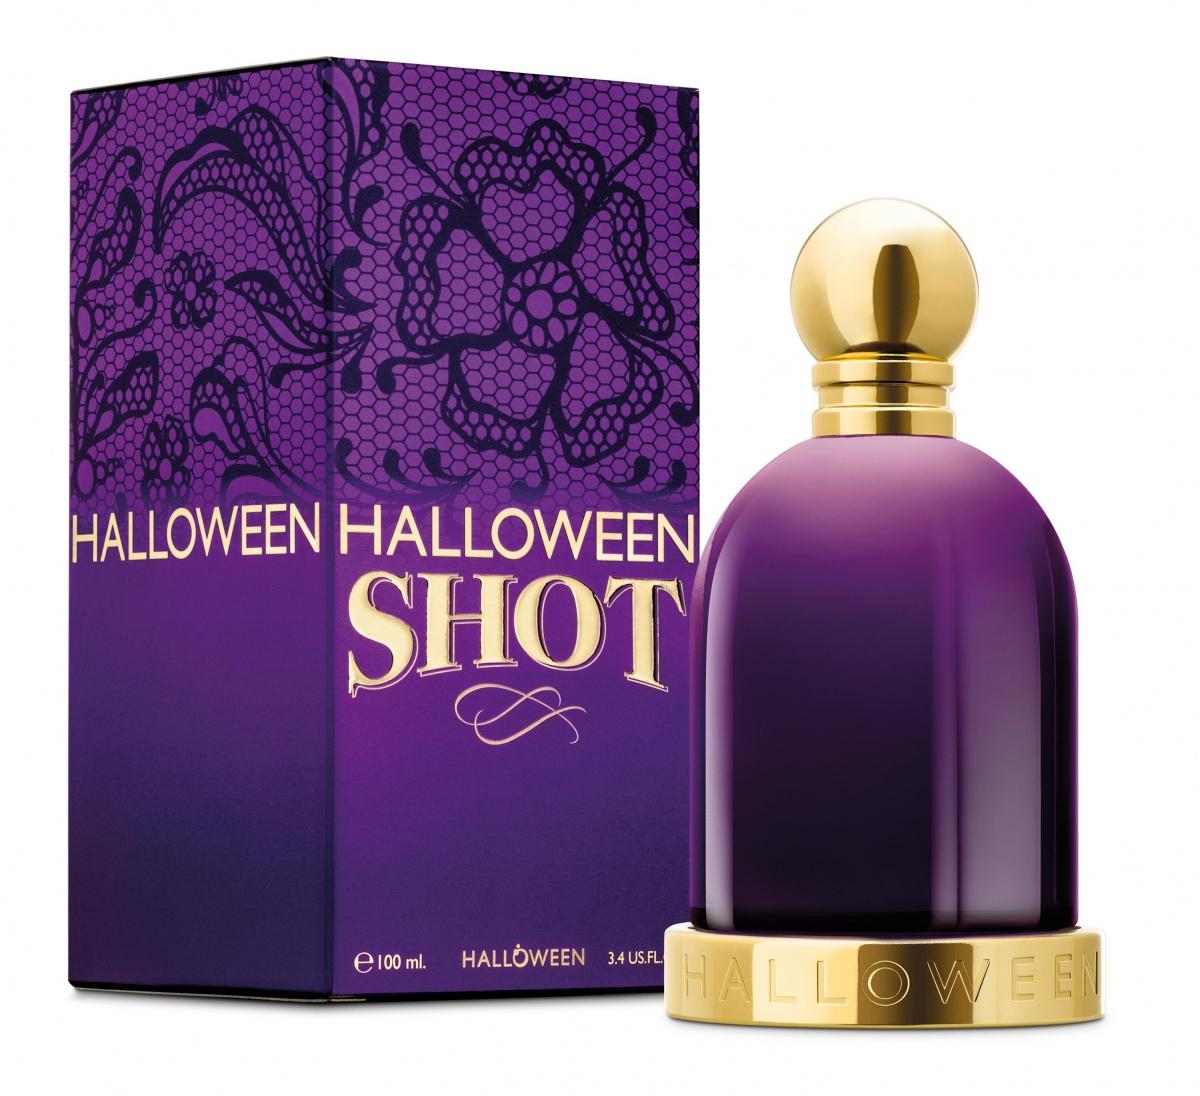 Perfume Halloween Tester: Halloween Shot Halloween Perfume